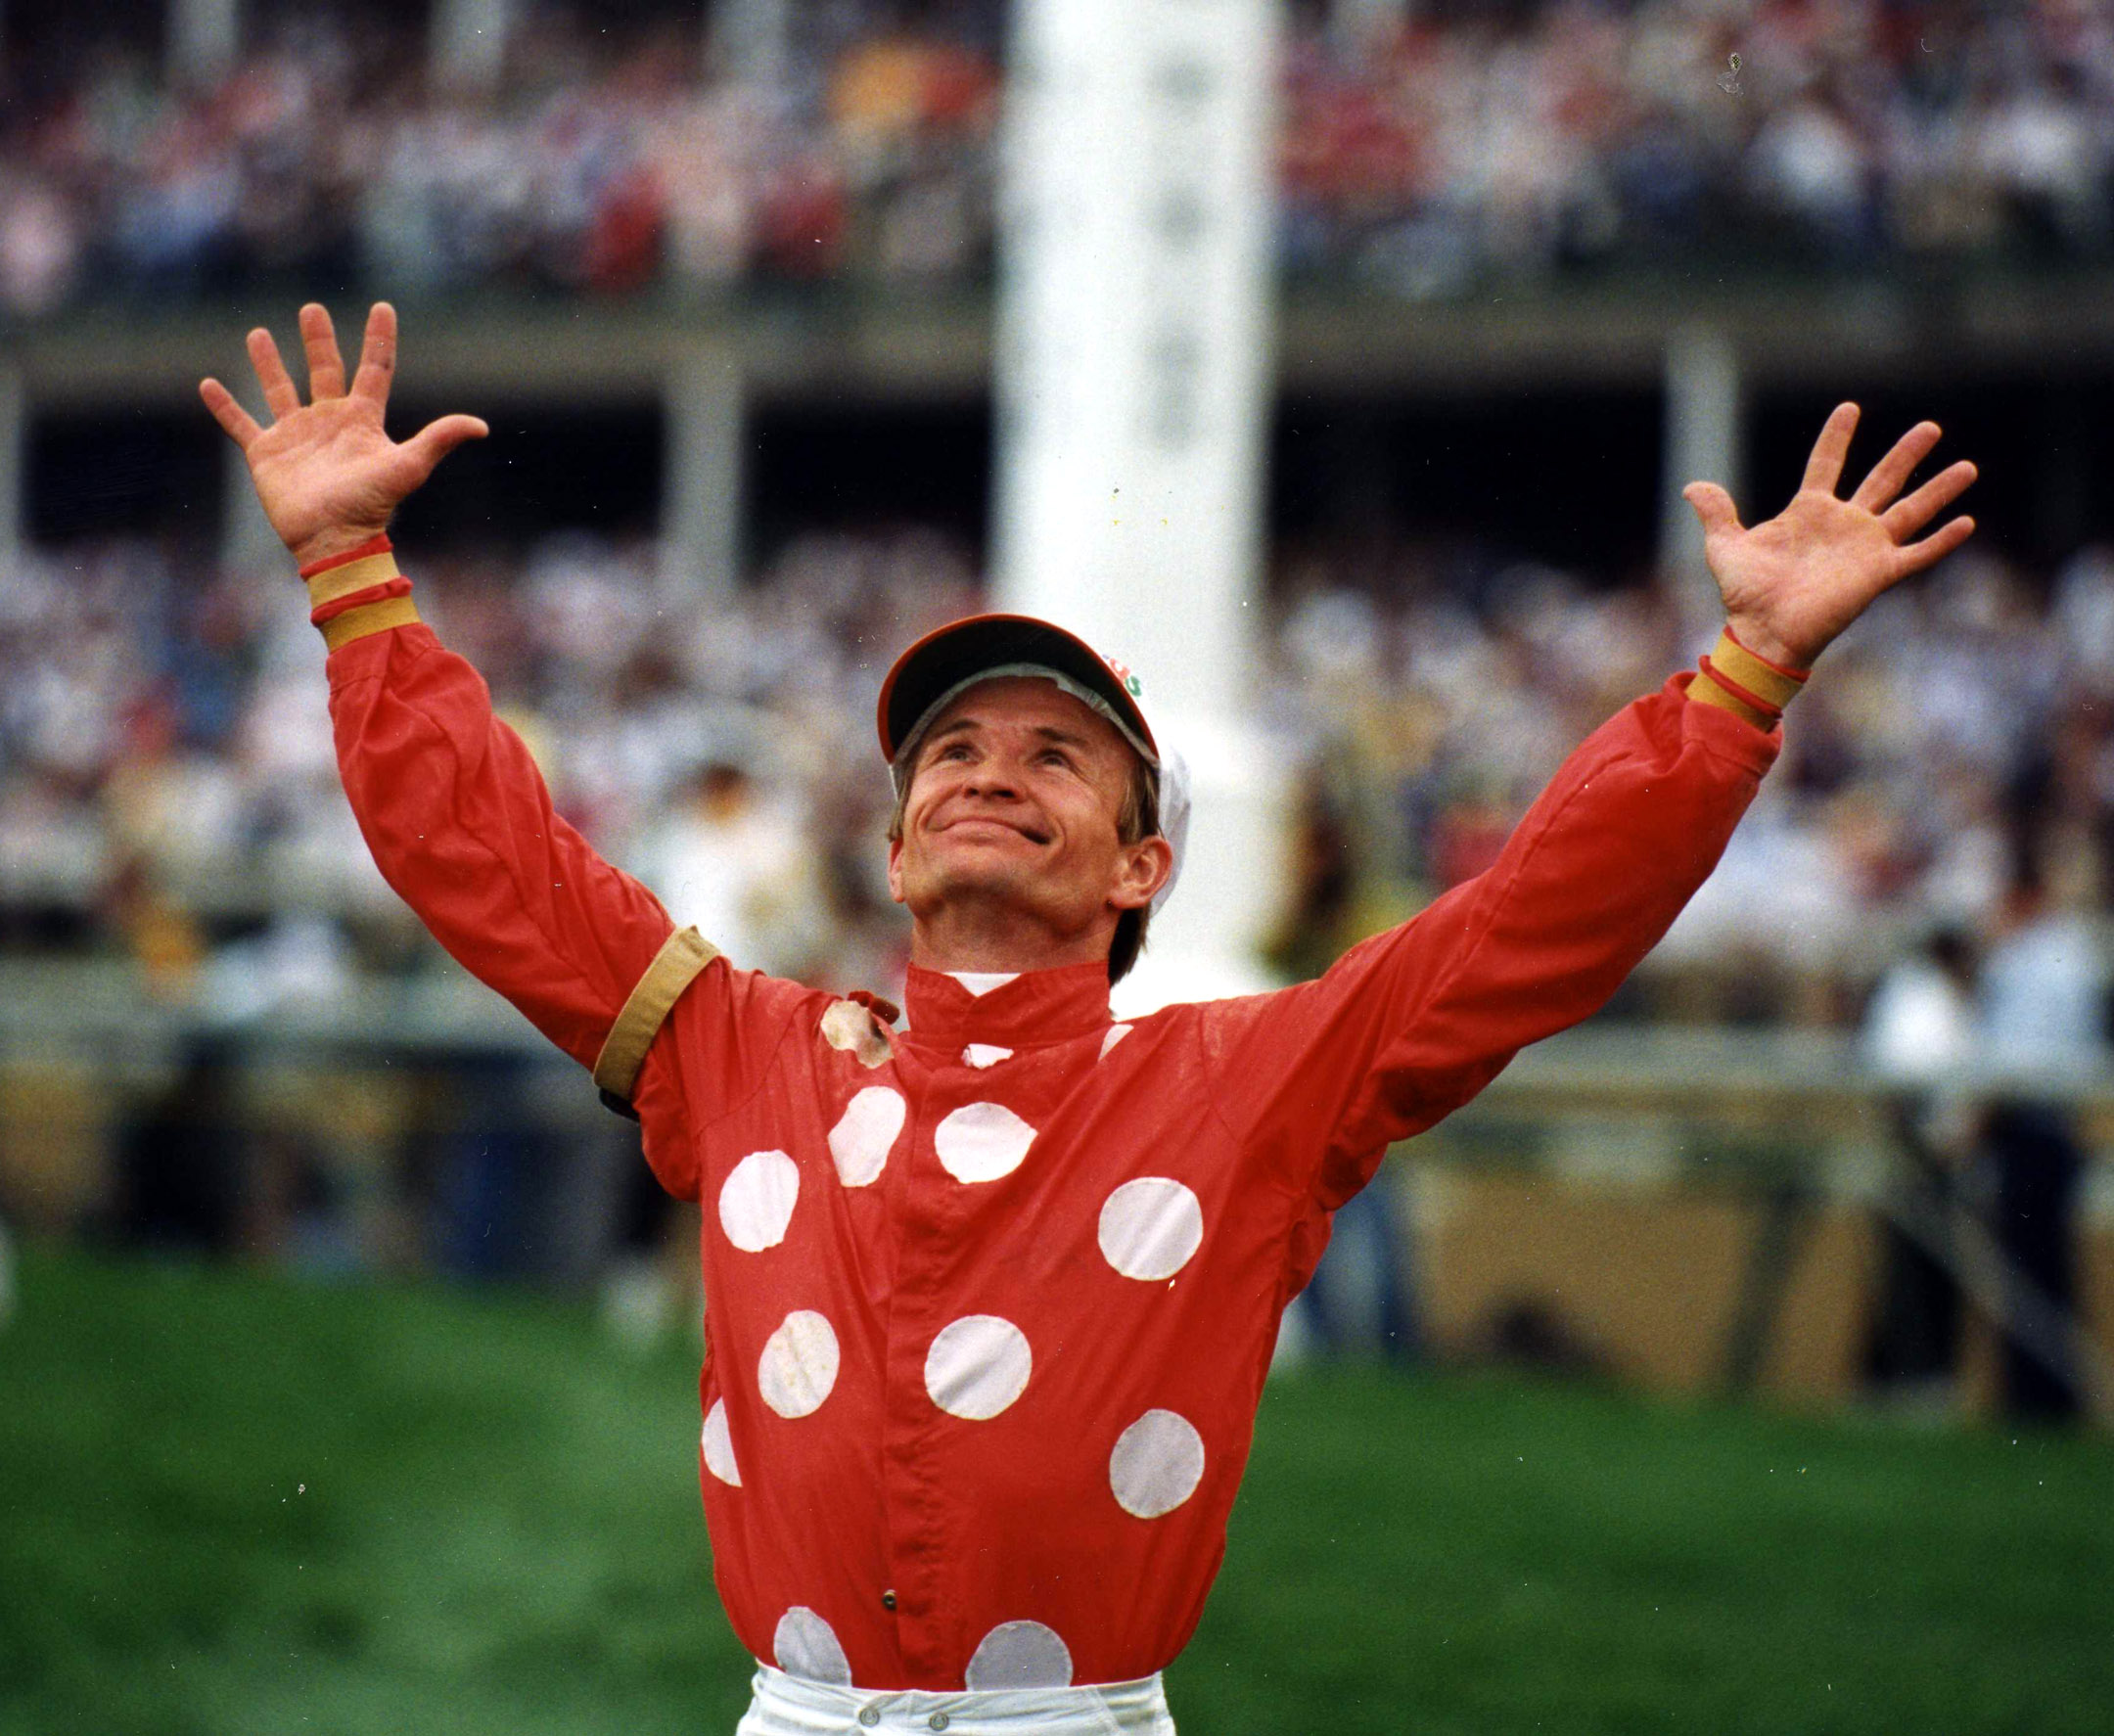 Pat Day celebrating after winning the 1992 Kentucky Derby with Lil E. Tee (Shigeki Kikkawa/Museum Collection)